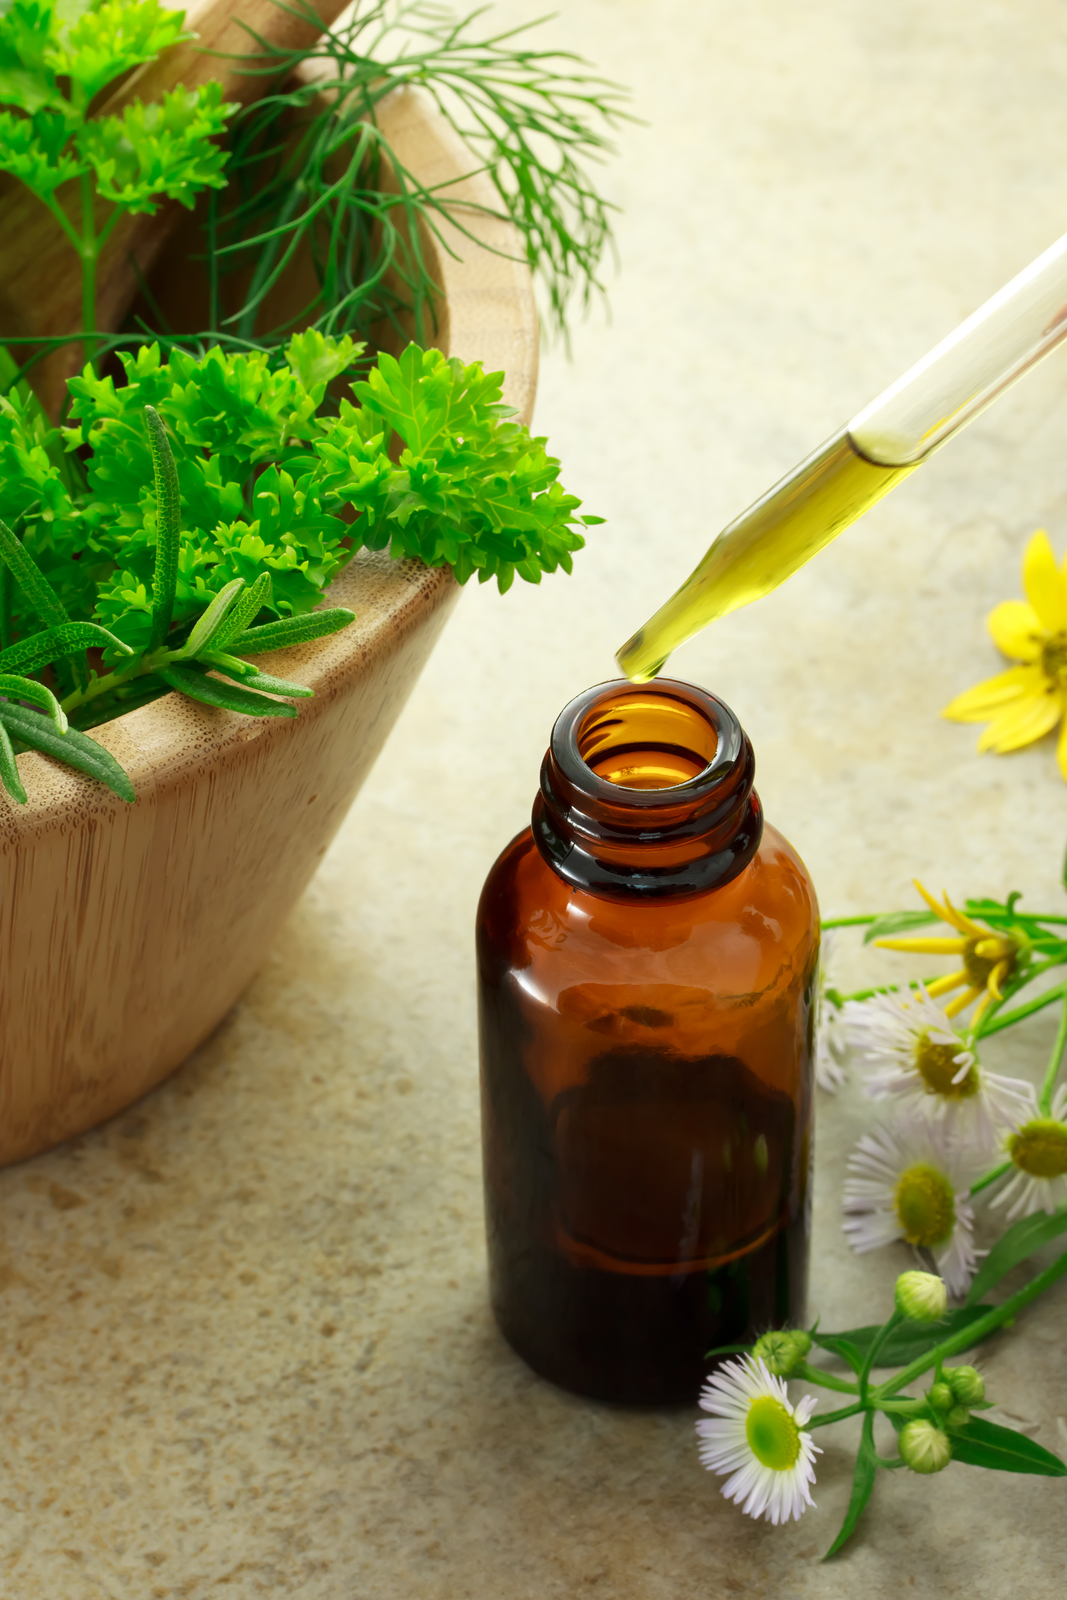 Botanical, herbs, allergies, asthma, natural treatments